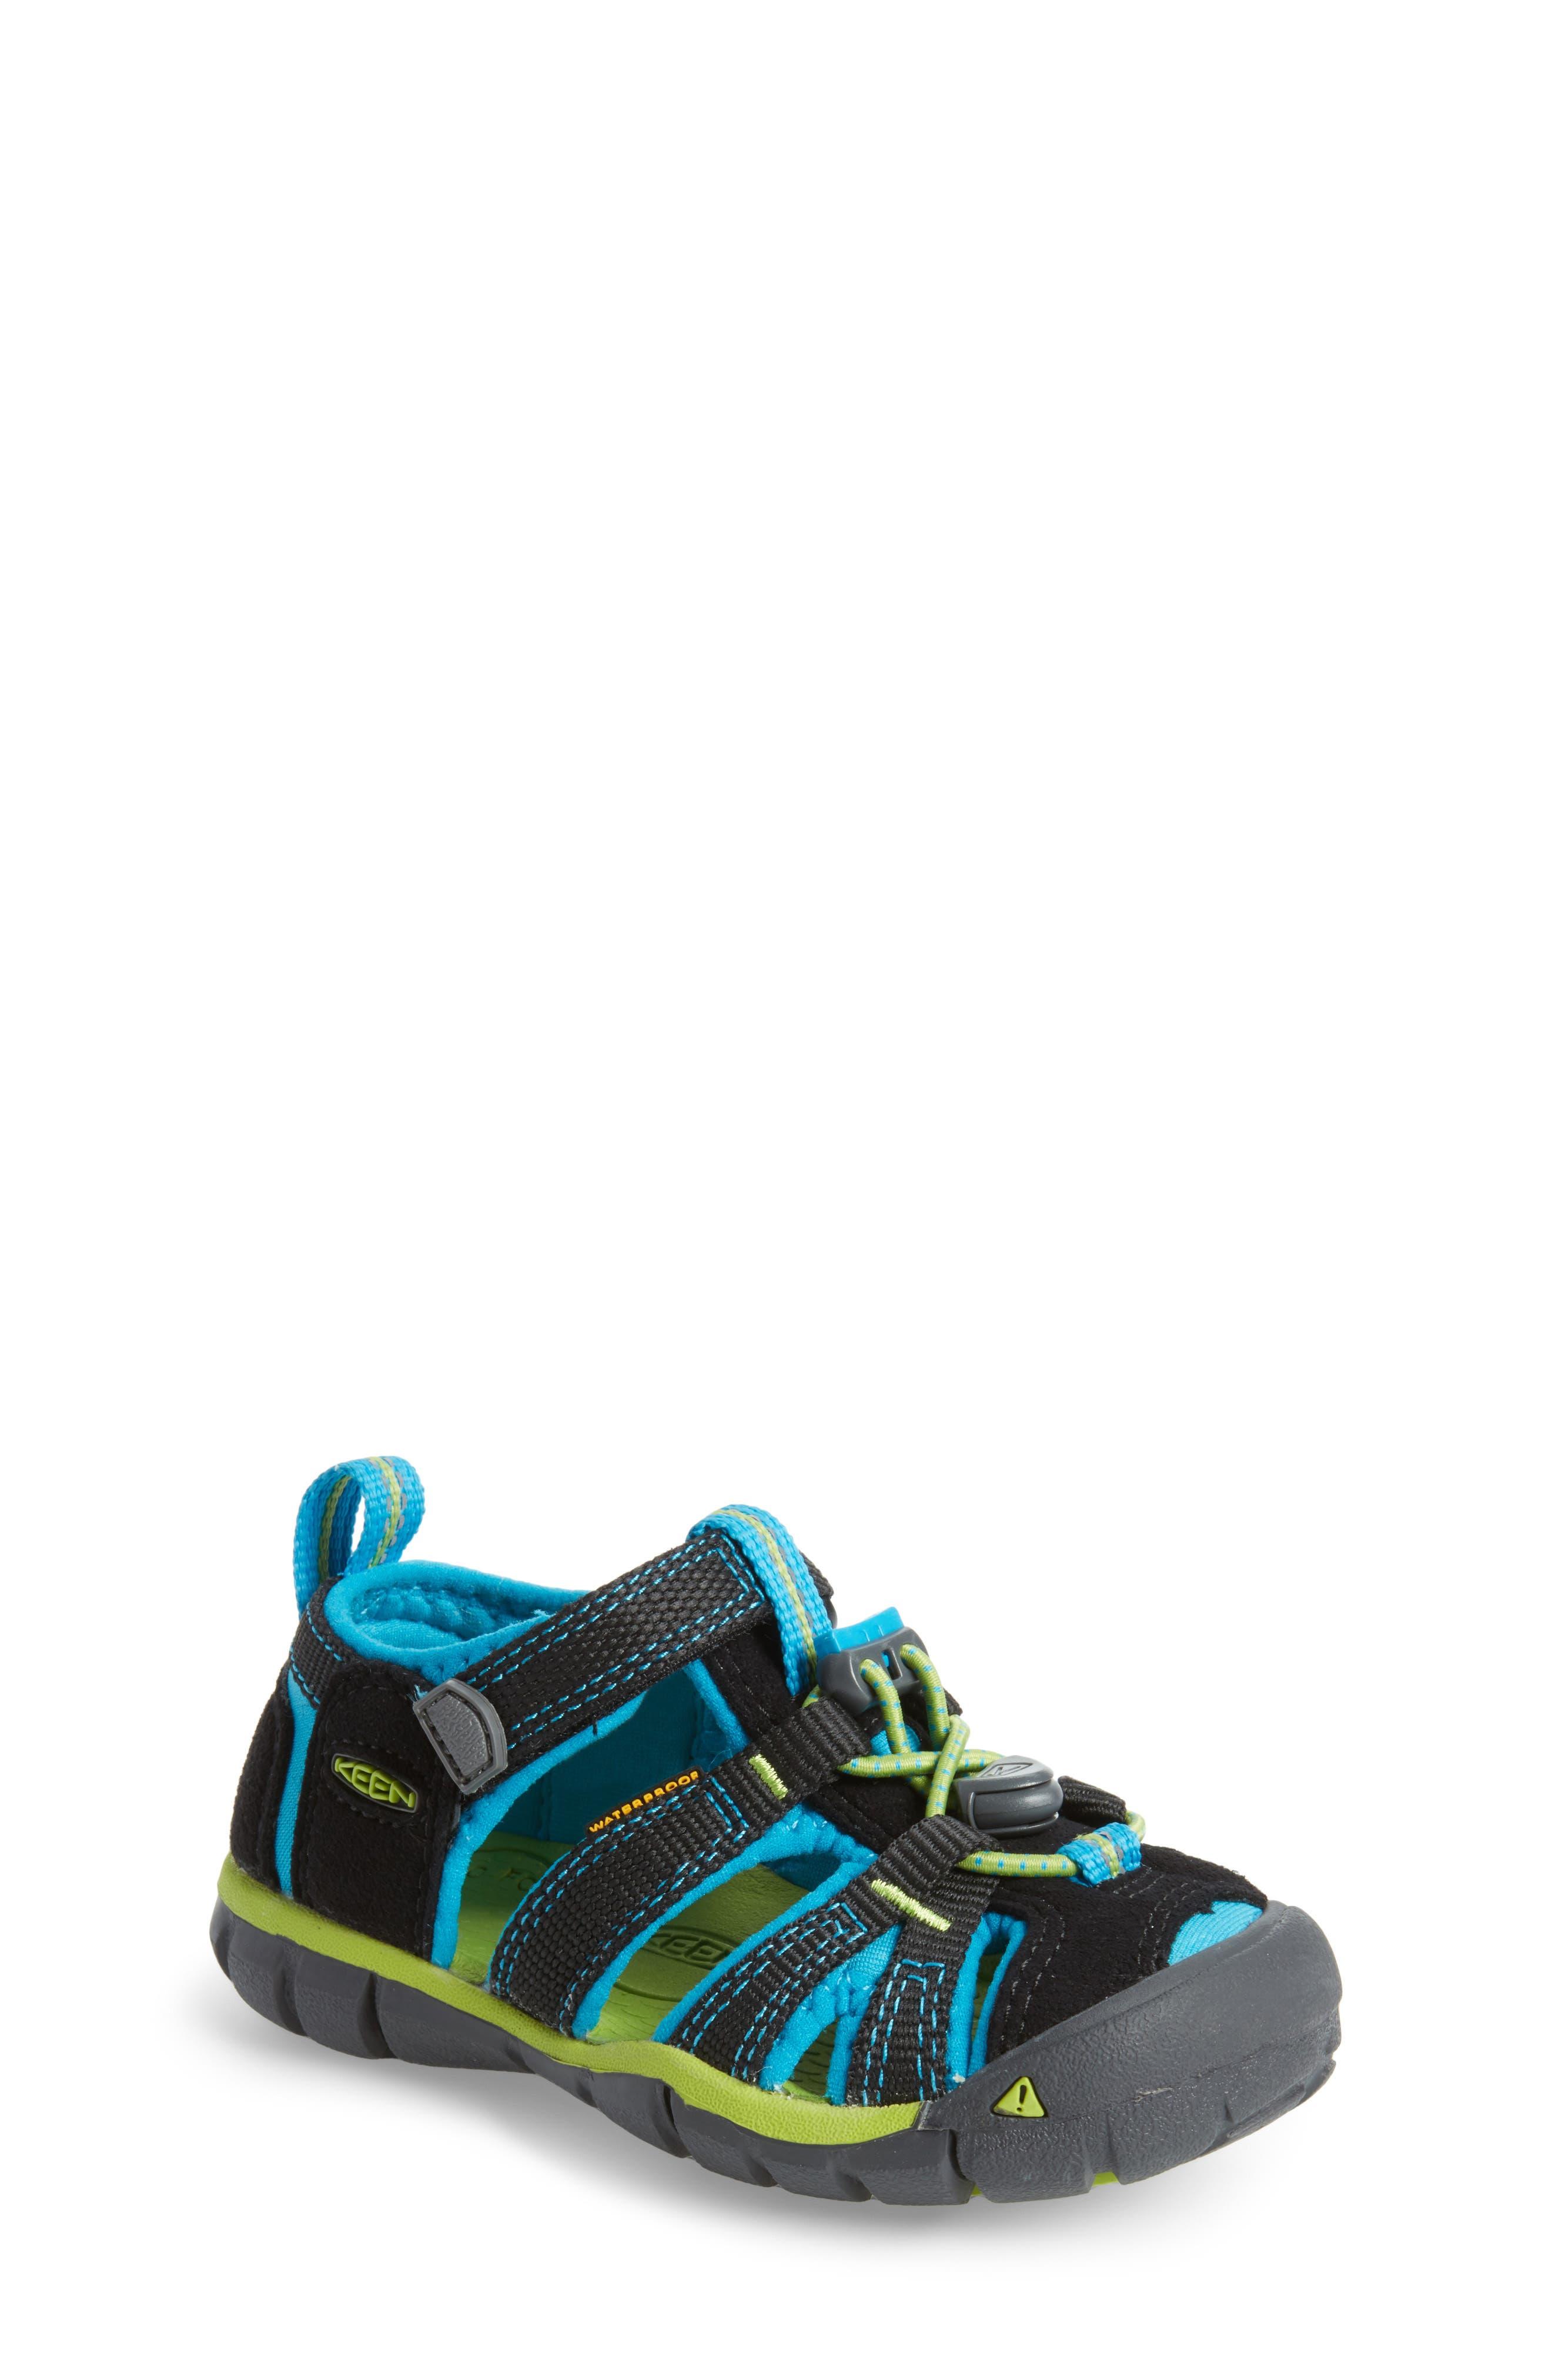 'Seacamp II' Water Friendly Sandal,                             Main thumbnail 1, color,                             012